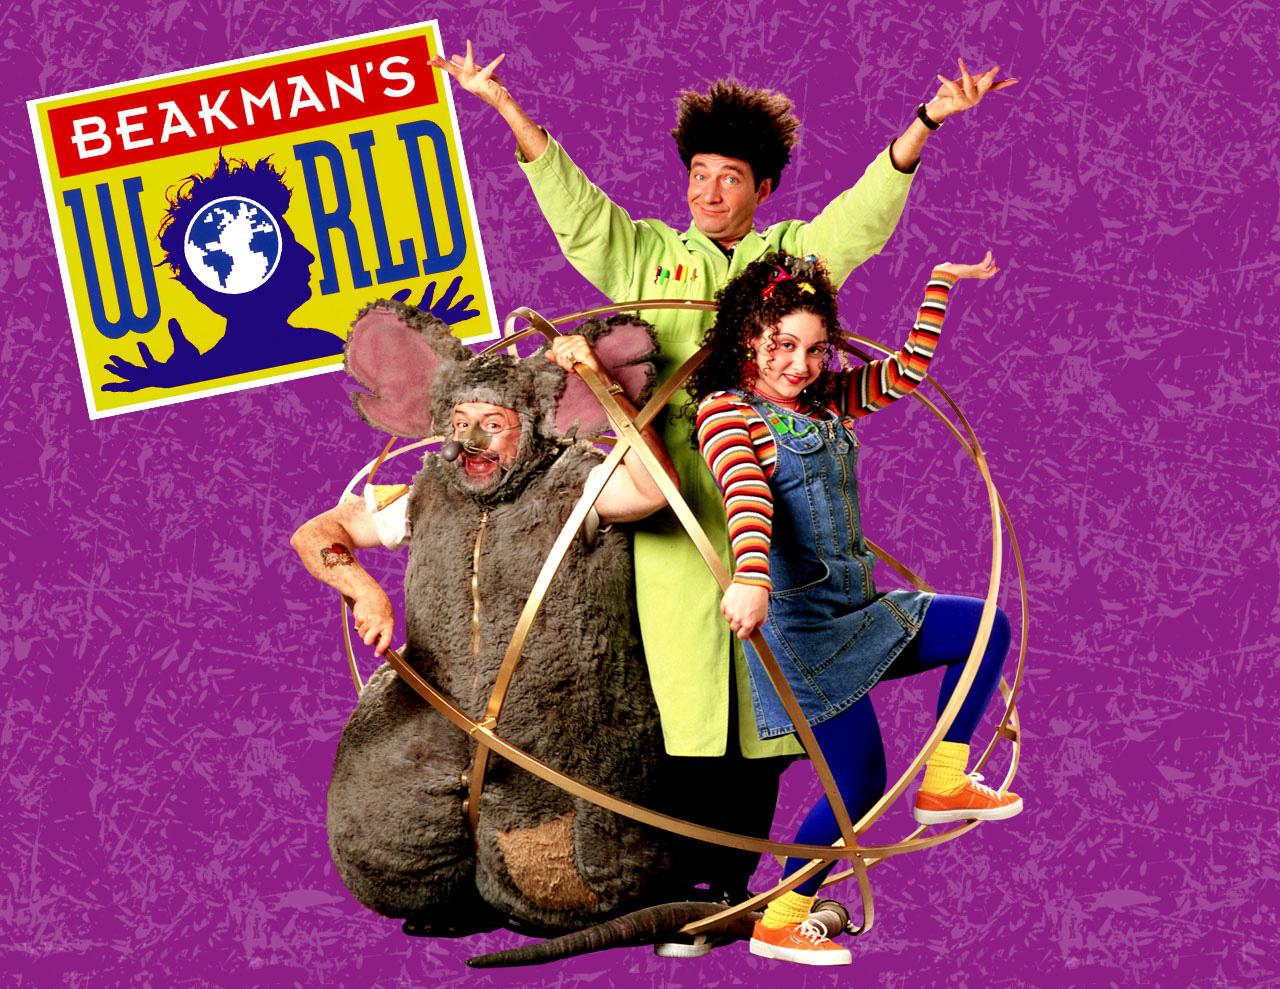 Beakman's World Cast